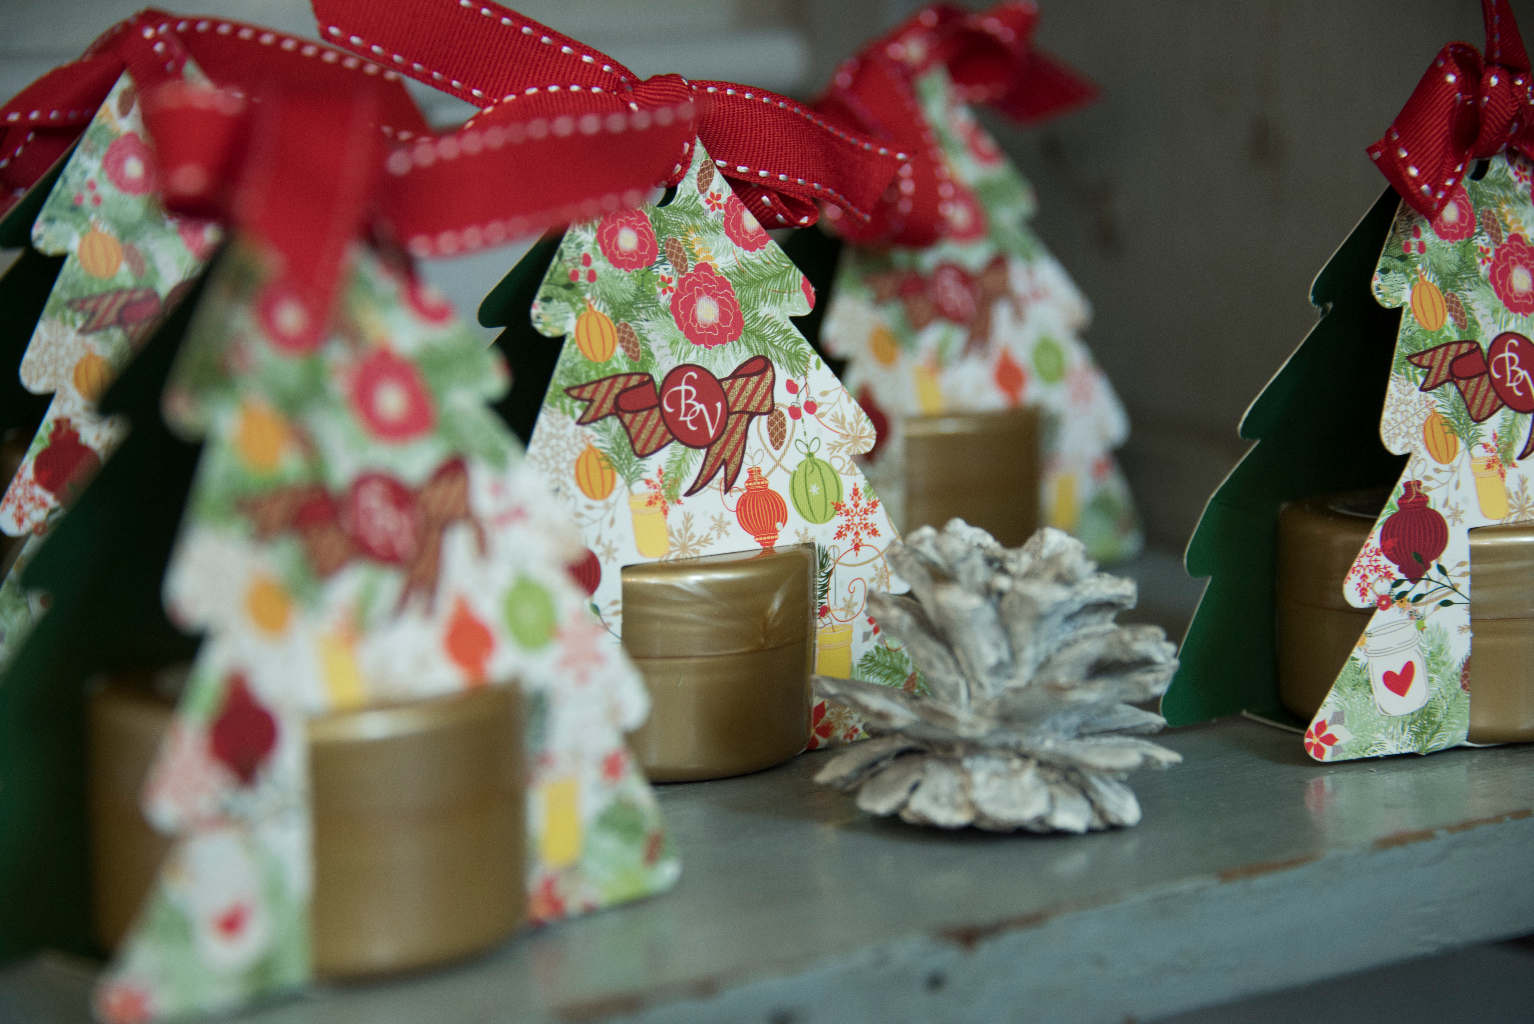 Bottega Verde Calendario Avvento.Bottega Verde Un Natale Al Bacio Sotto Il Vischio